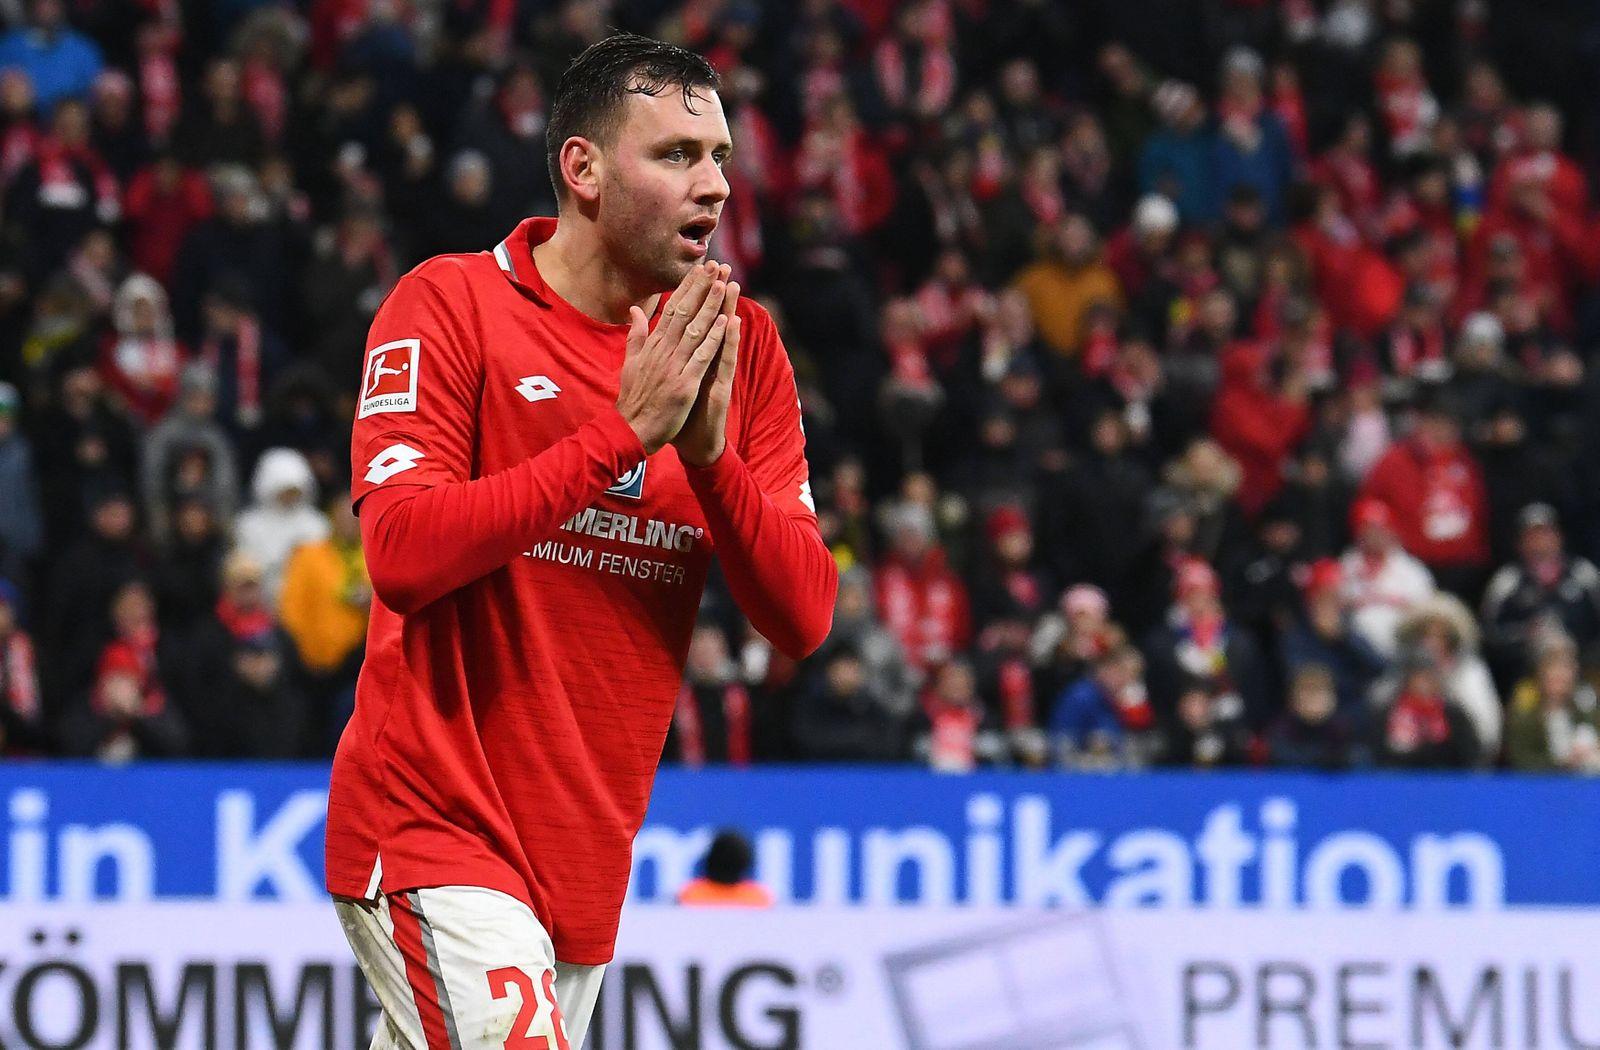 14.12.2019, xfux, Fussball 1.Bundesliga, FSV Mainz 05 - Borussia Dortmund, azspor, emspor, v.l. Adam Szalai (FSV Mainz